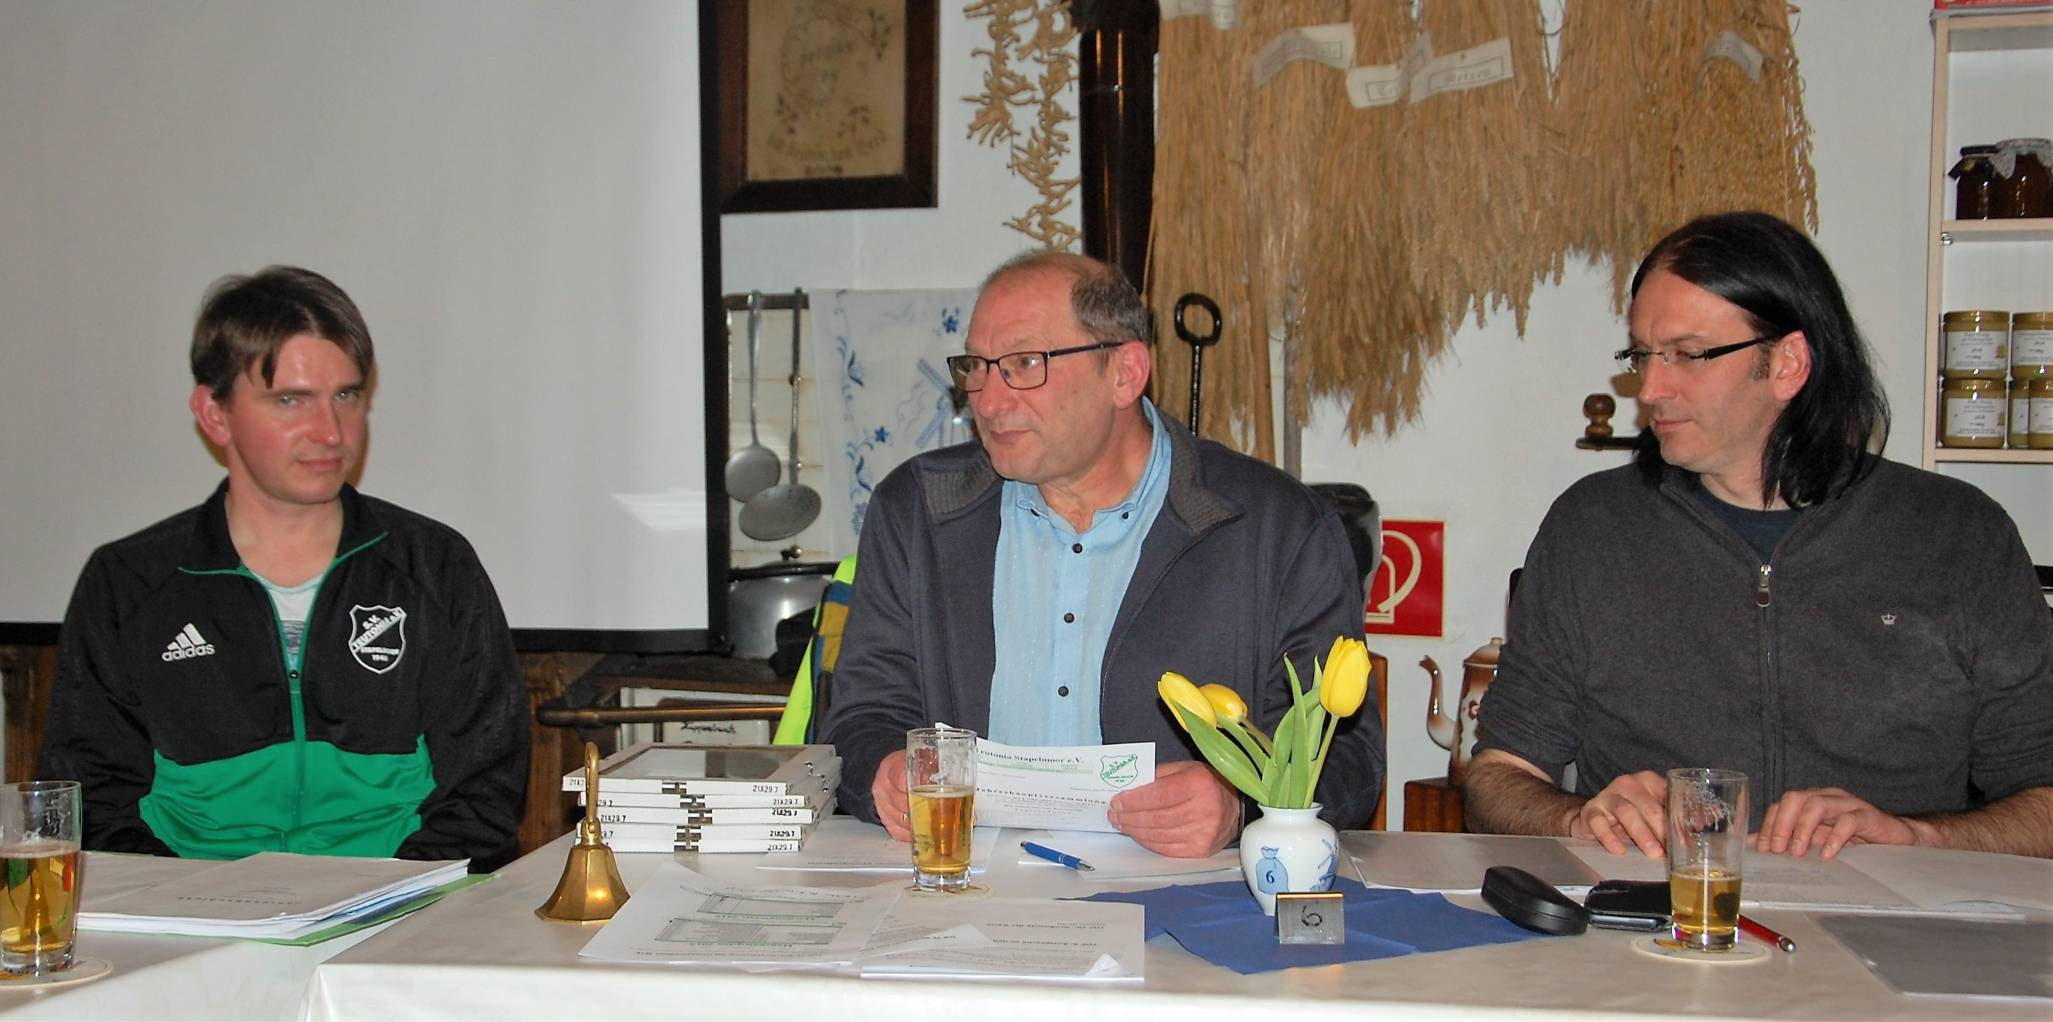 SV Teutonia Stapelmoor - Aktuelles & Infos